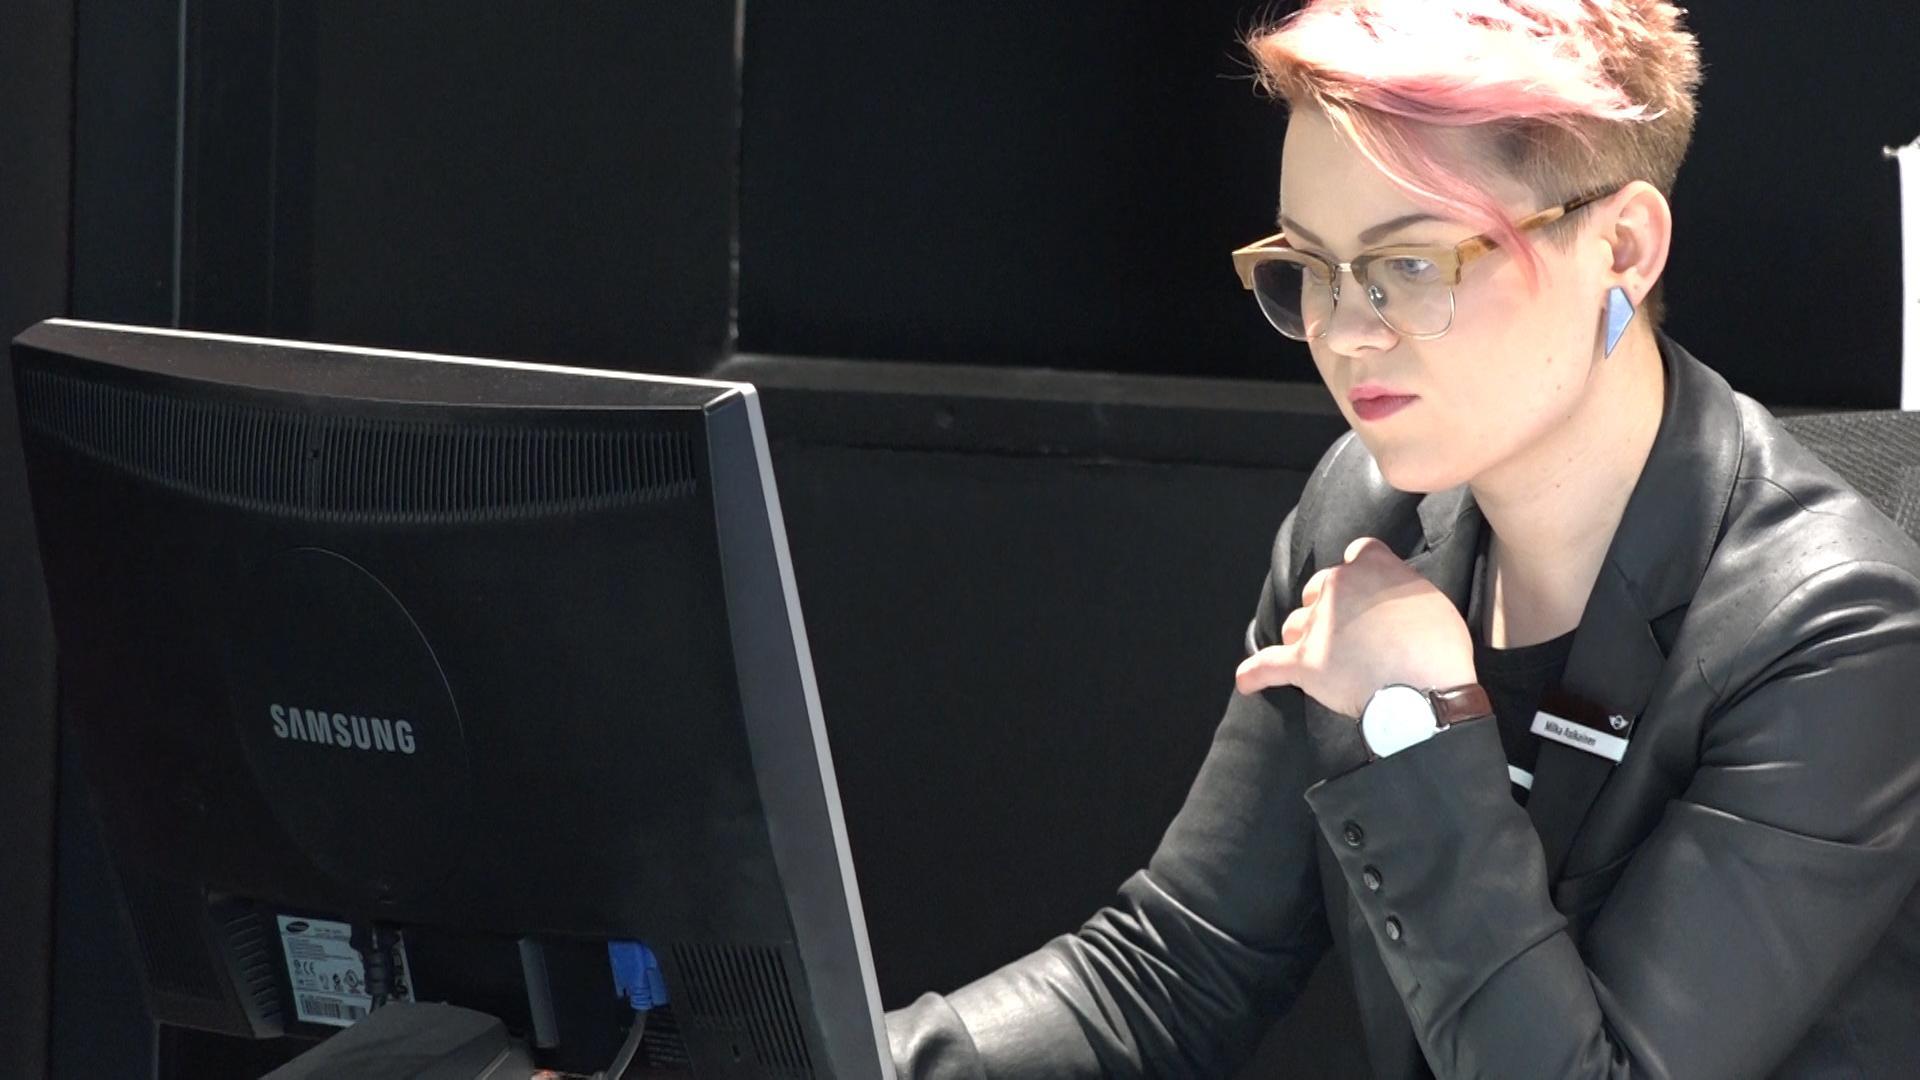 huoli maton pillua nuolee lesbot Lesbo sarja kuva porno vids